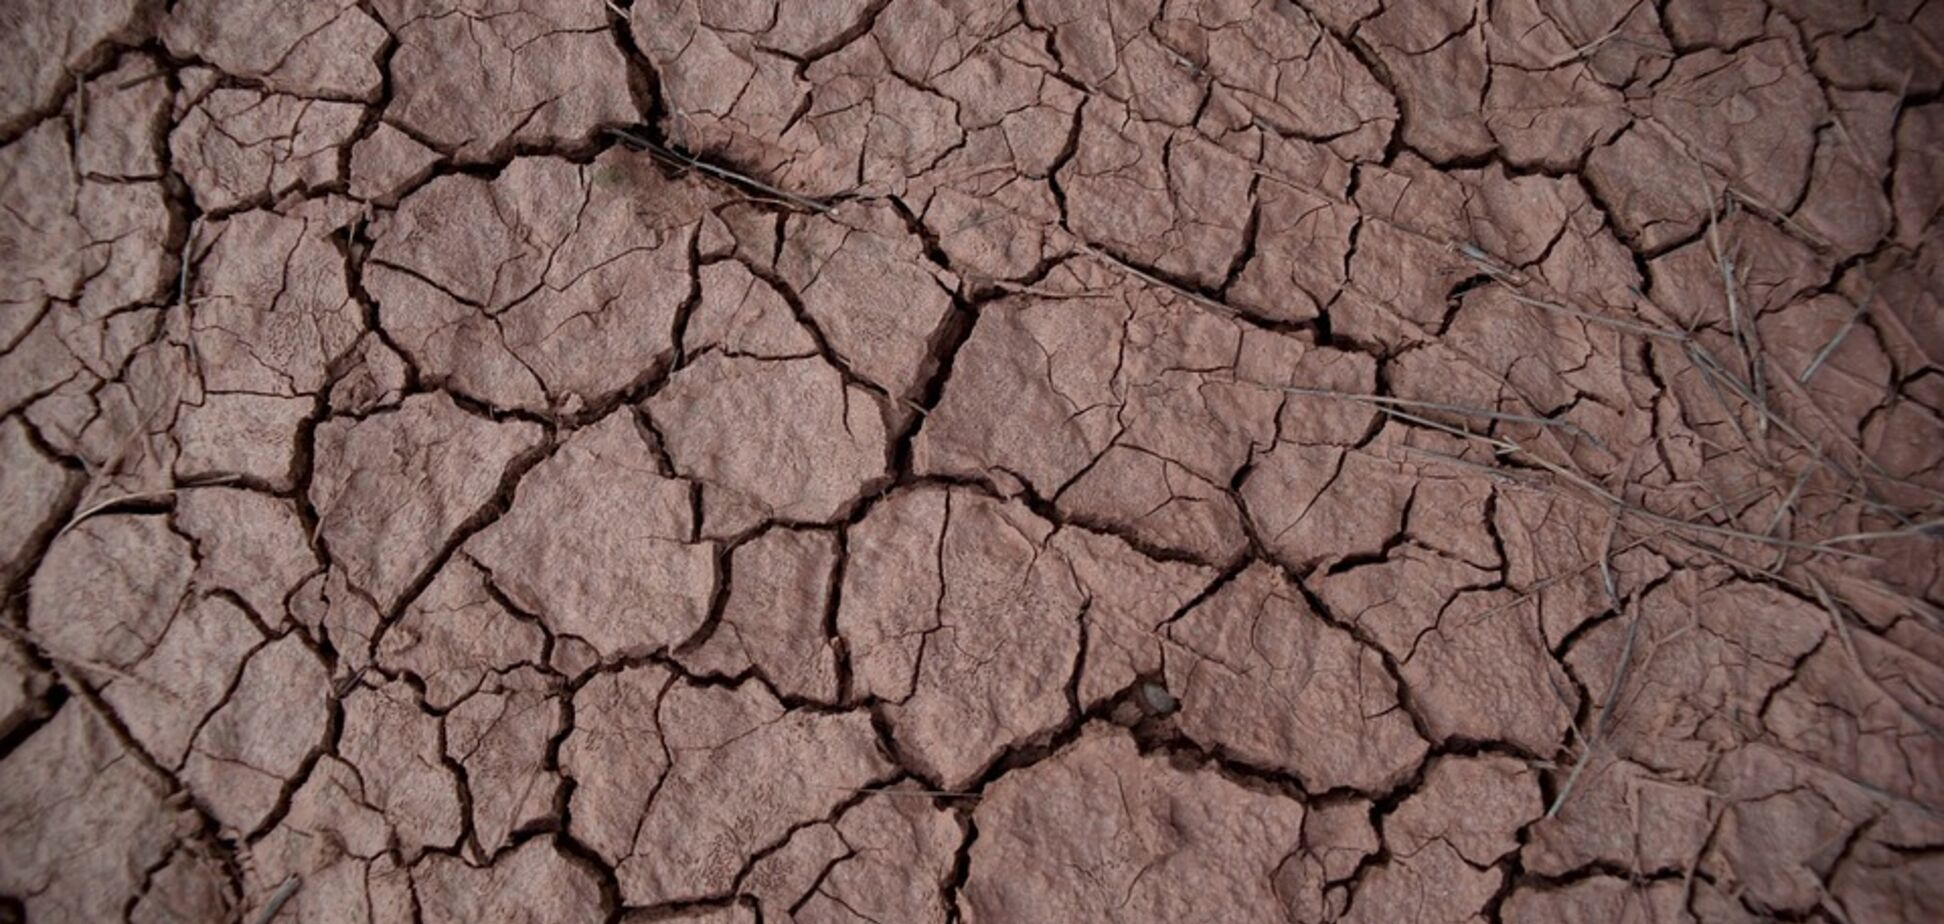 Україна не поверне воду до окупованого Криму - постпред Порошенка